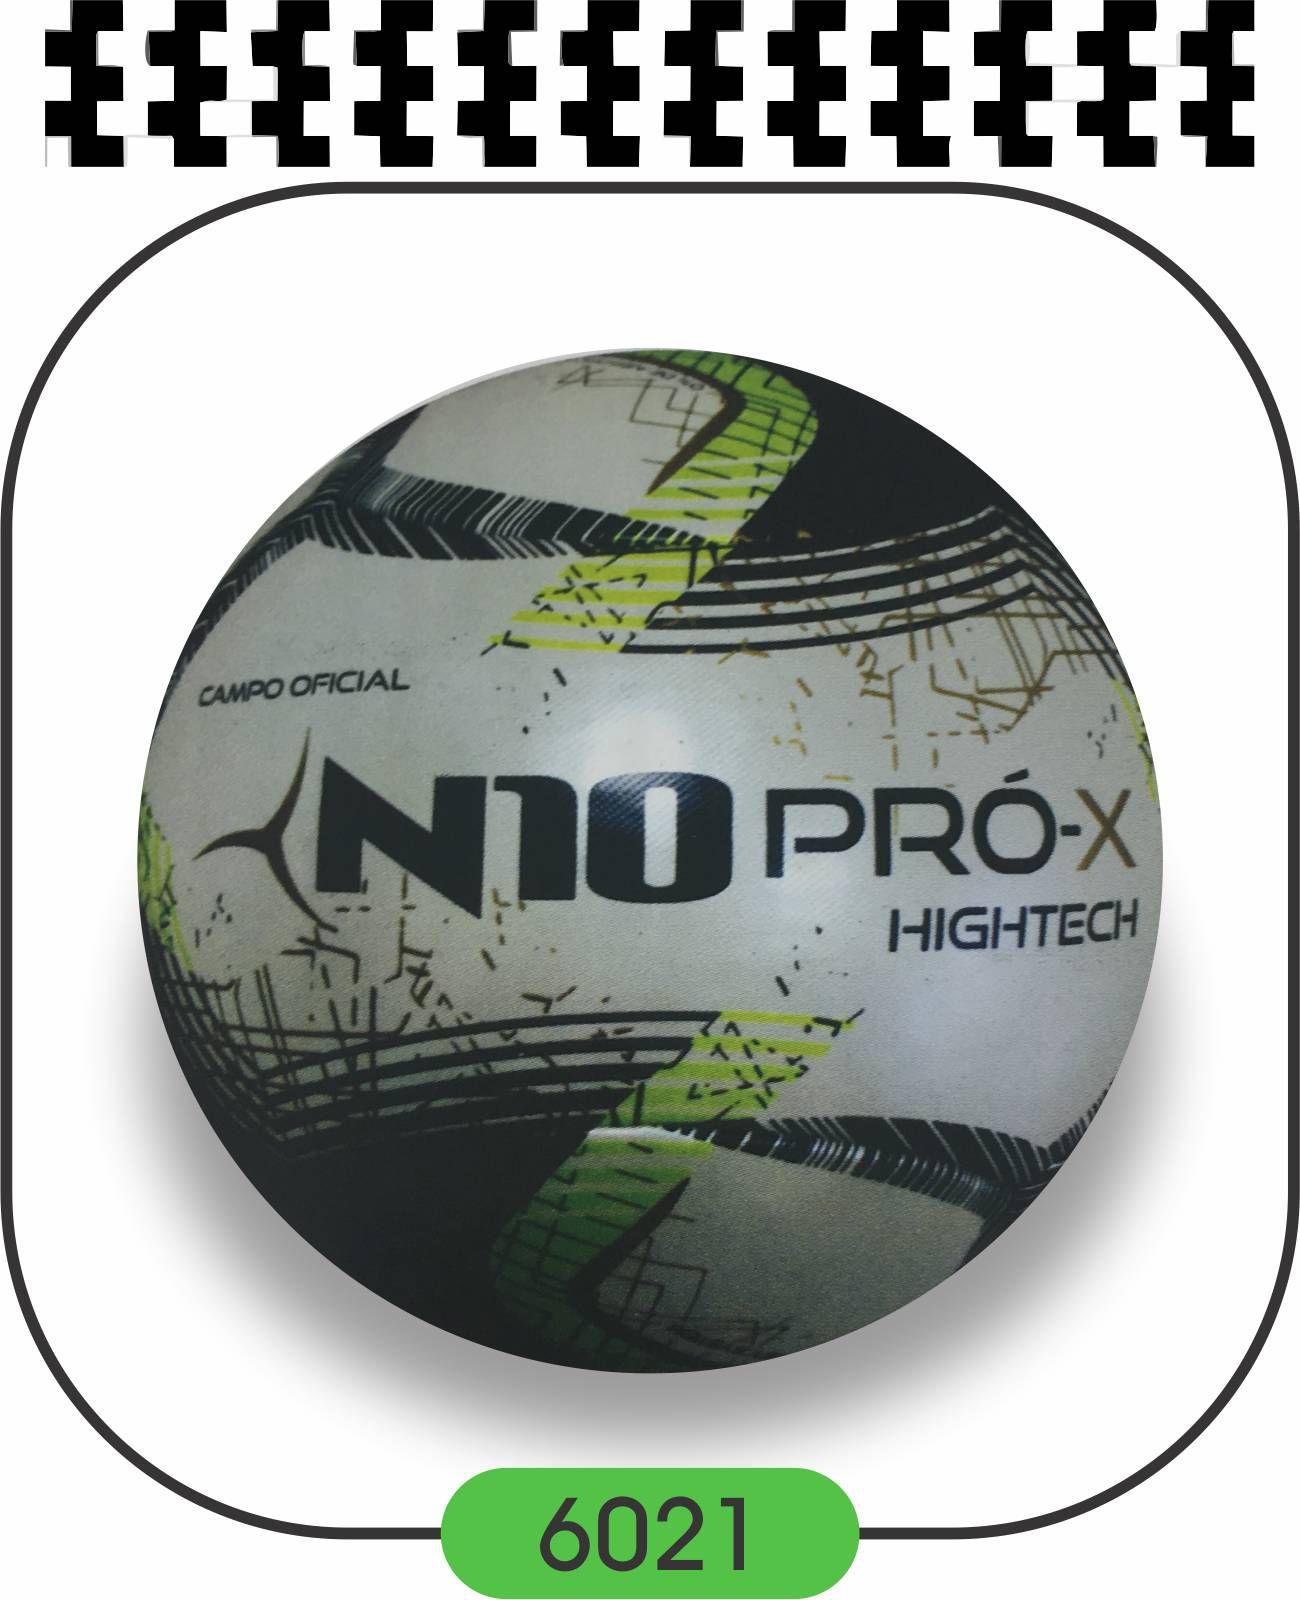 Bola de Futebol de Campo N10 PRO-X HIGHTECH - TERMOFUSY  - Bolas Lassabia - Bolas e Brindes Personalizados